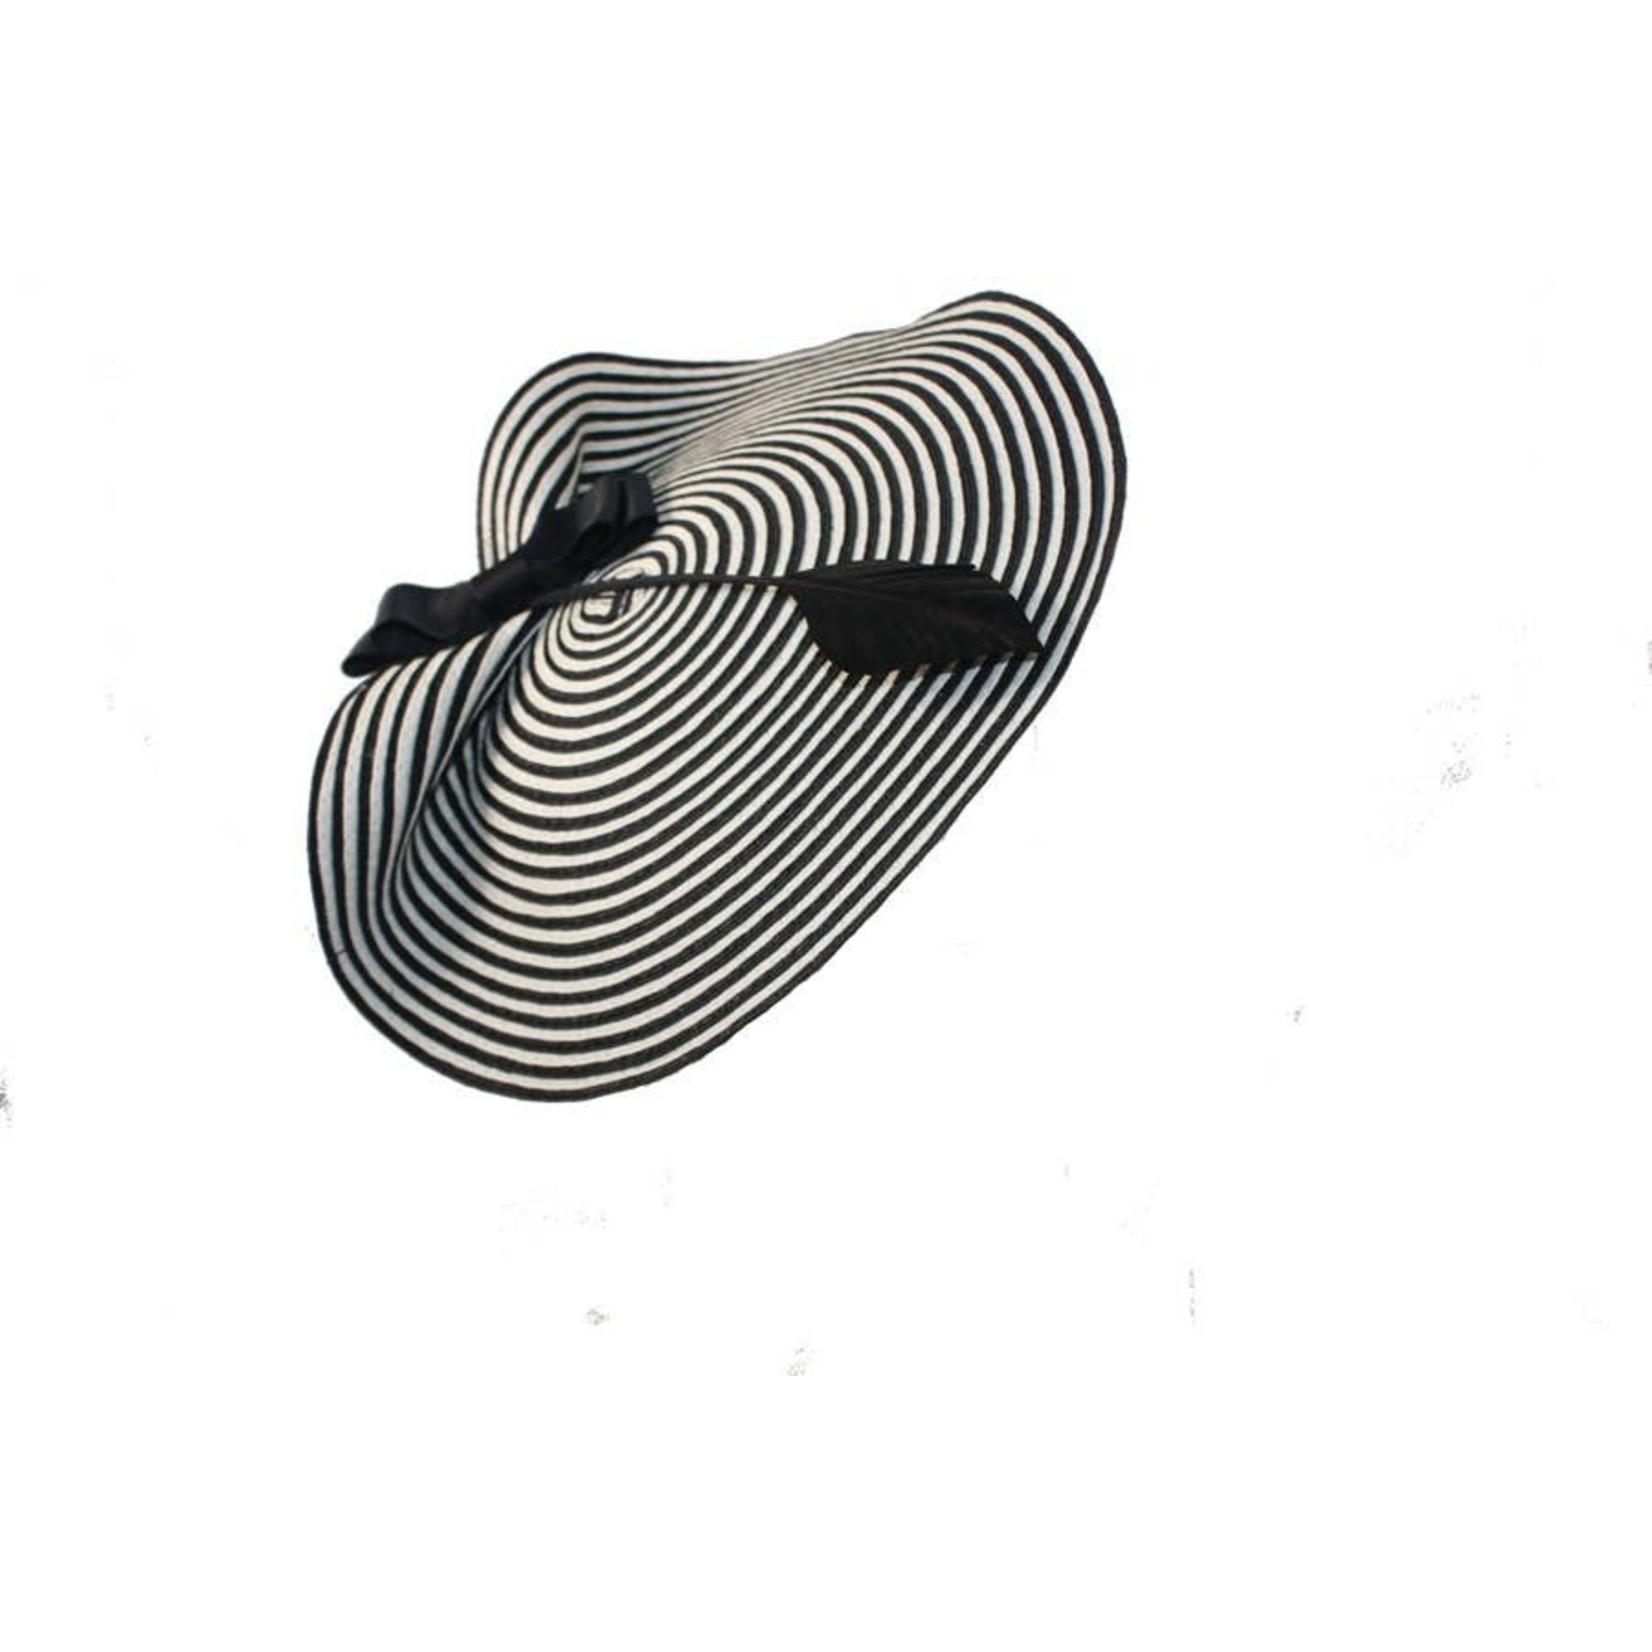 Jeanne Simmons Fascinator Headband of Blk/Wht Paperbraid Disc